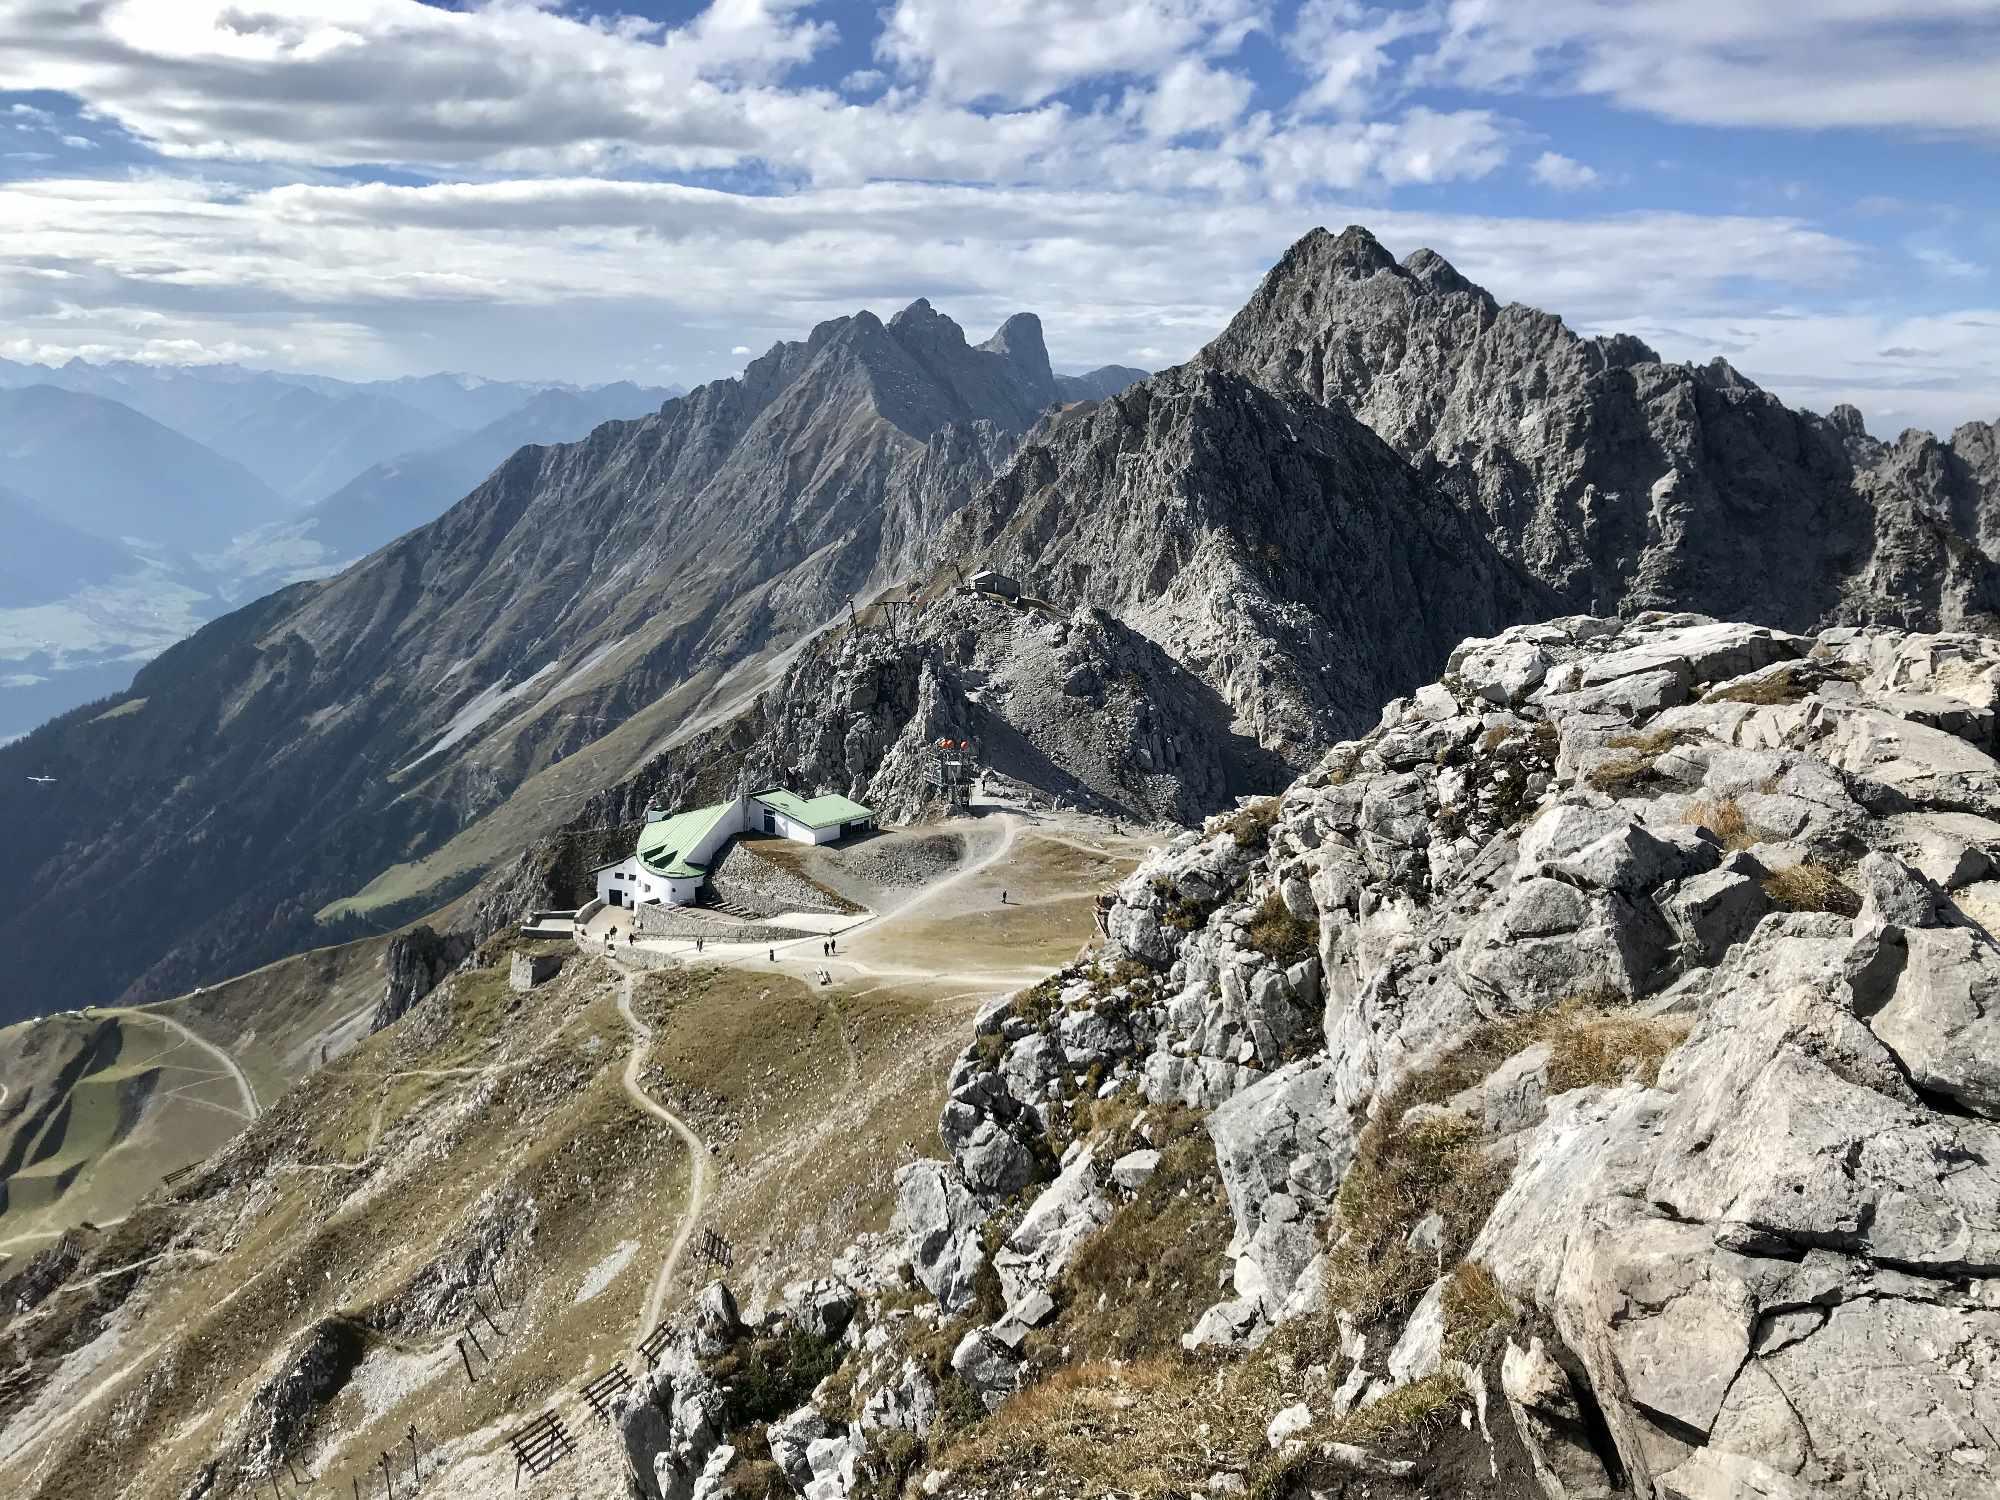 Sightseeing Innsbruck - Top of Innsbruck, Hafelekar